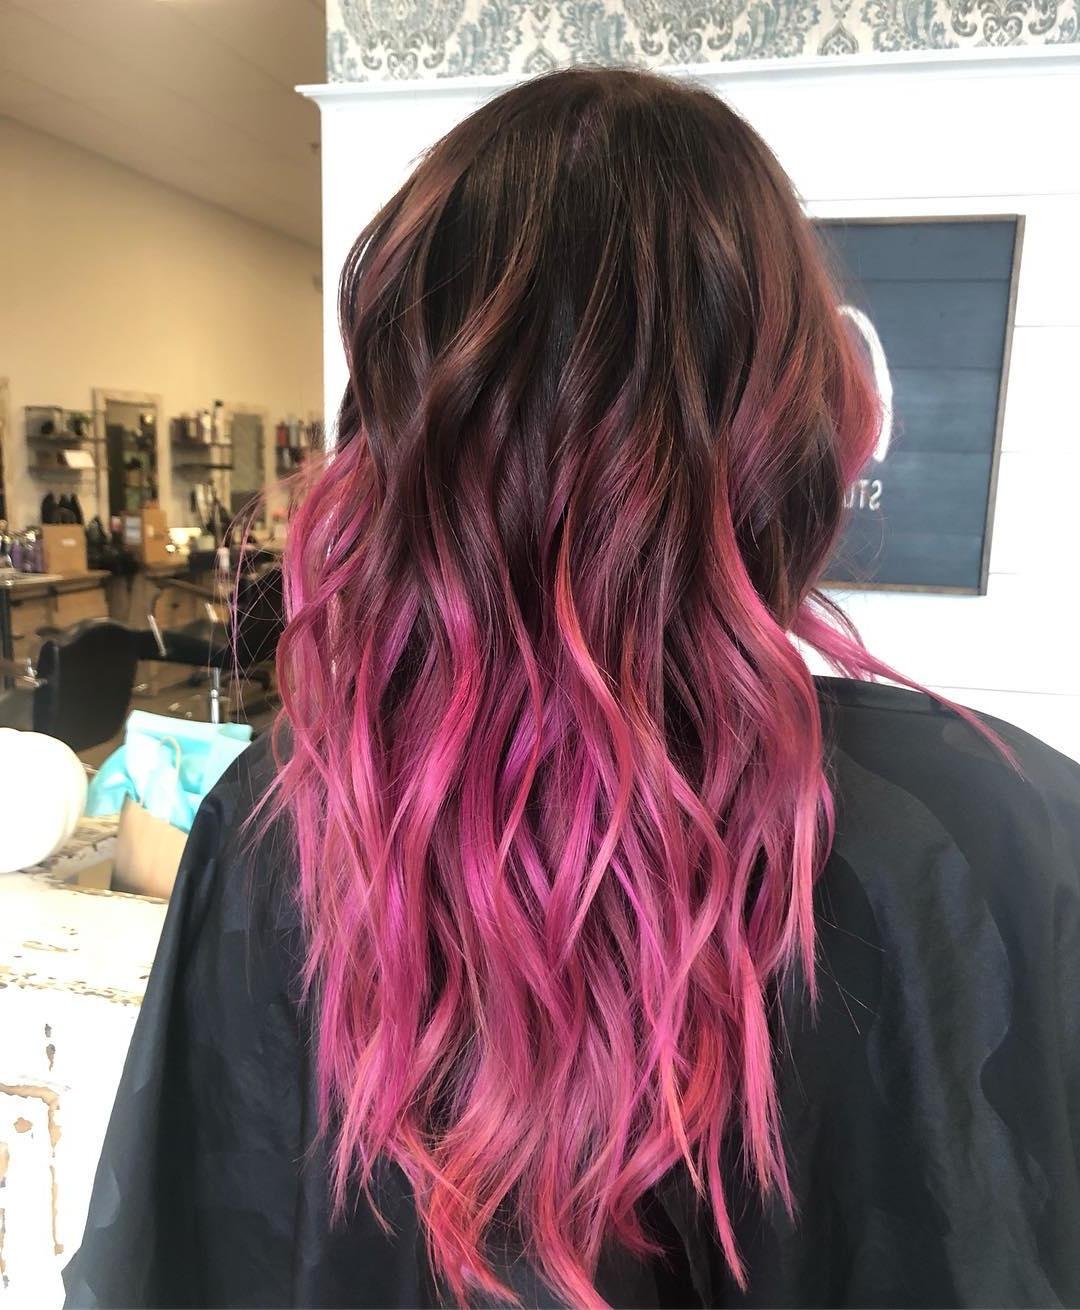 highlights hair brown dark caramel short pixie pink blonde shortpixiecuts cuts colored 2021 subtle colors ombre auburn